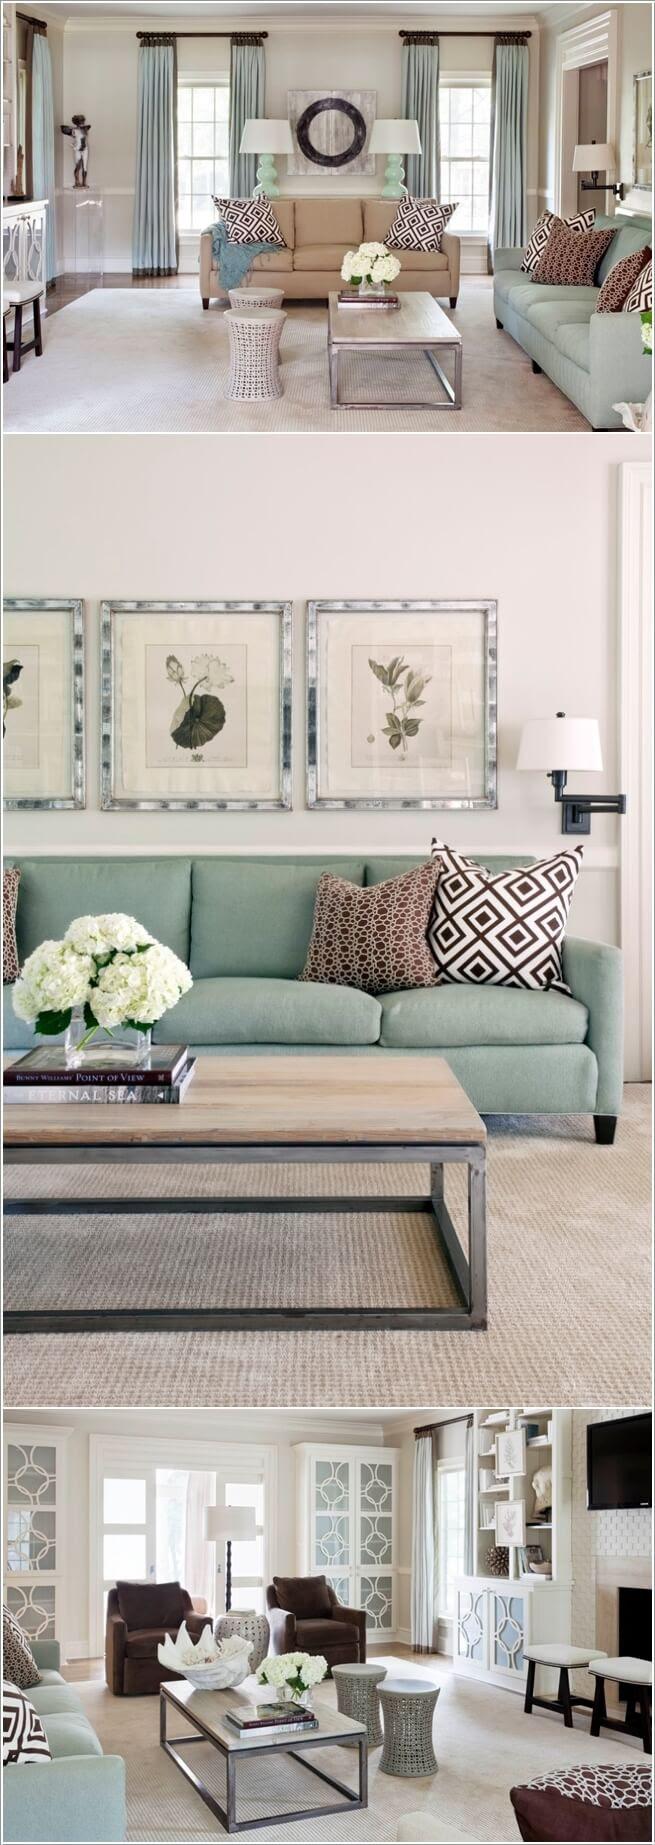 29 Nature Inspired Living Room Decor Ideas